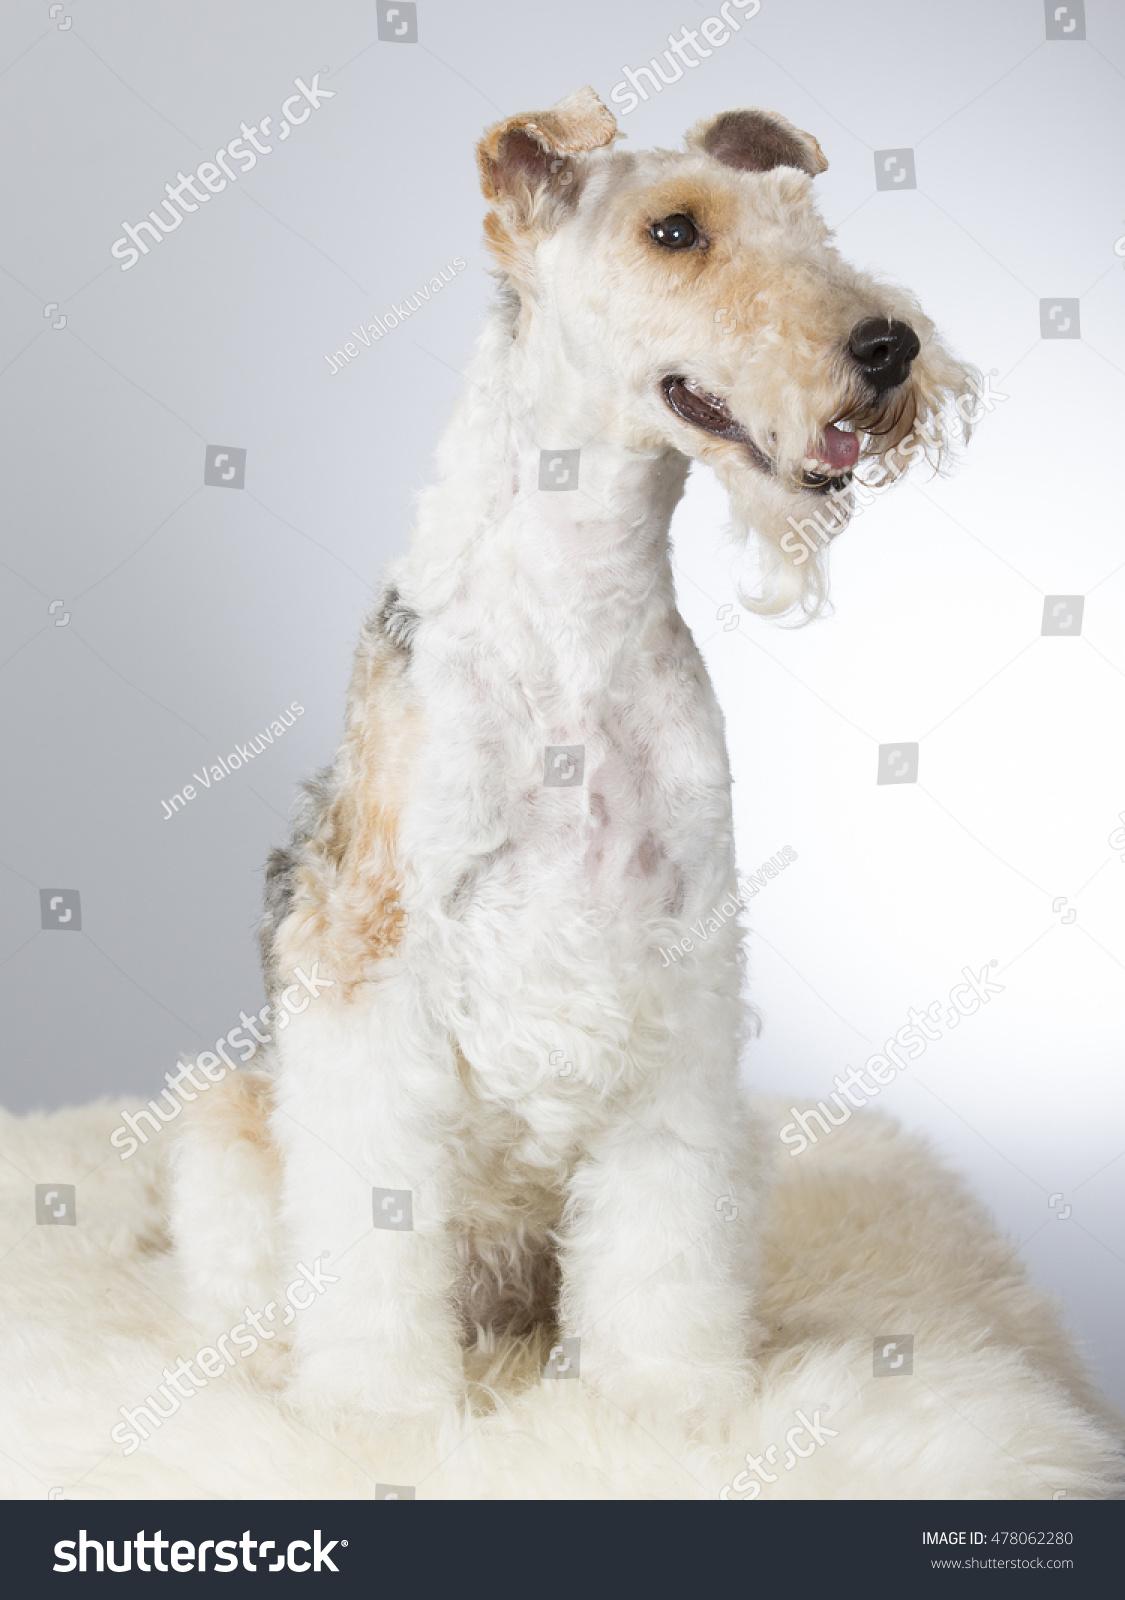 Wire Fox Terrier Portrait Image Taken Stock Photo (Royalty Free ...